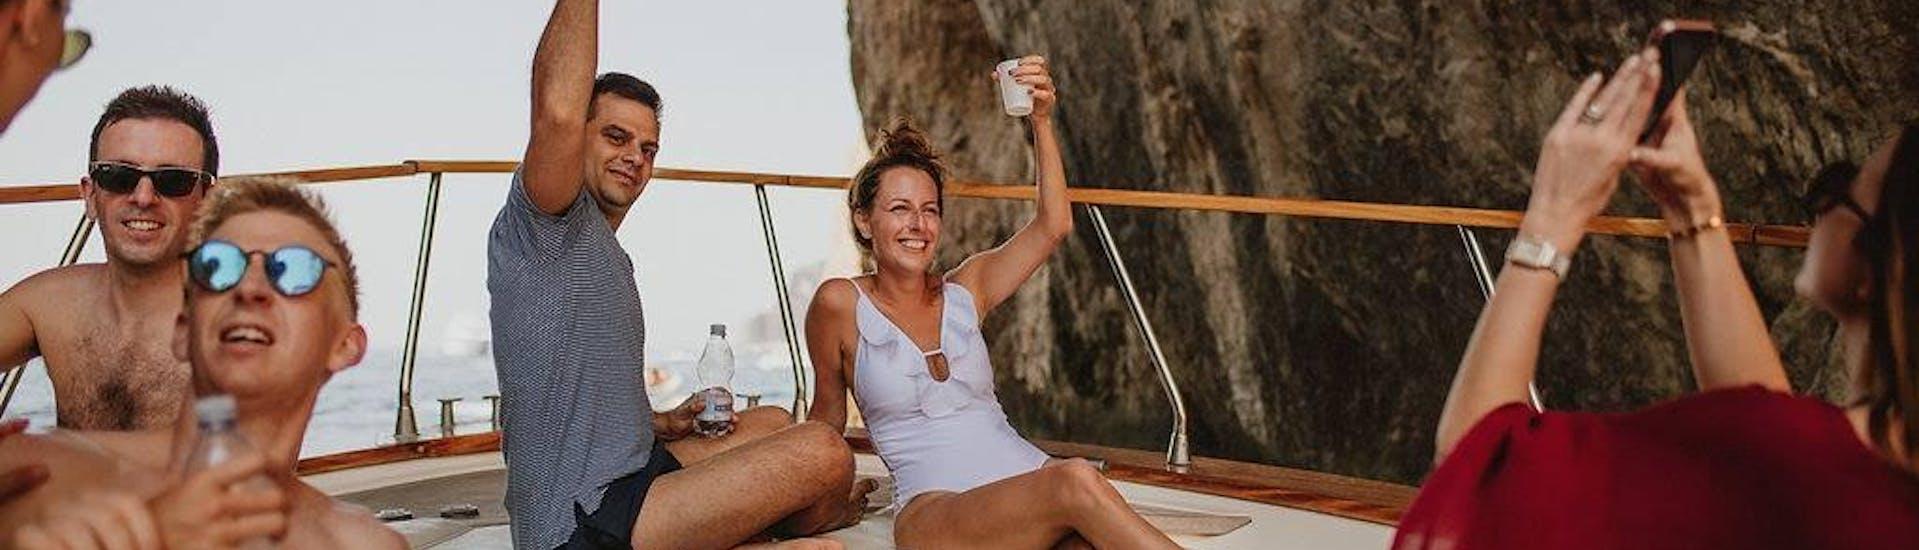 boat-trip-to-capri-with-snorkeling-capitano-ago-hero